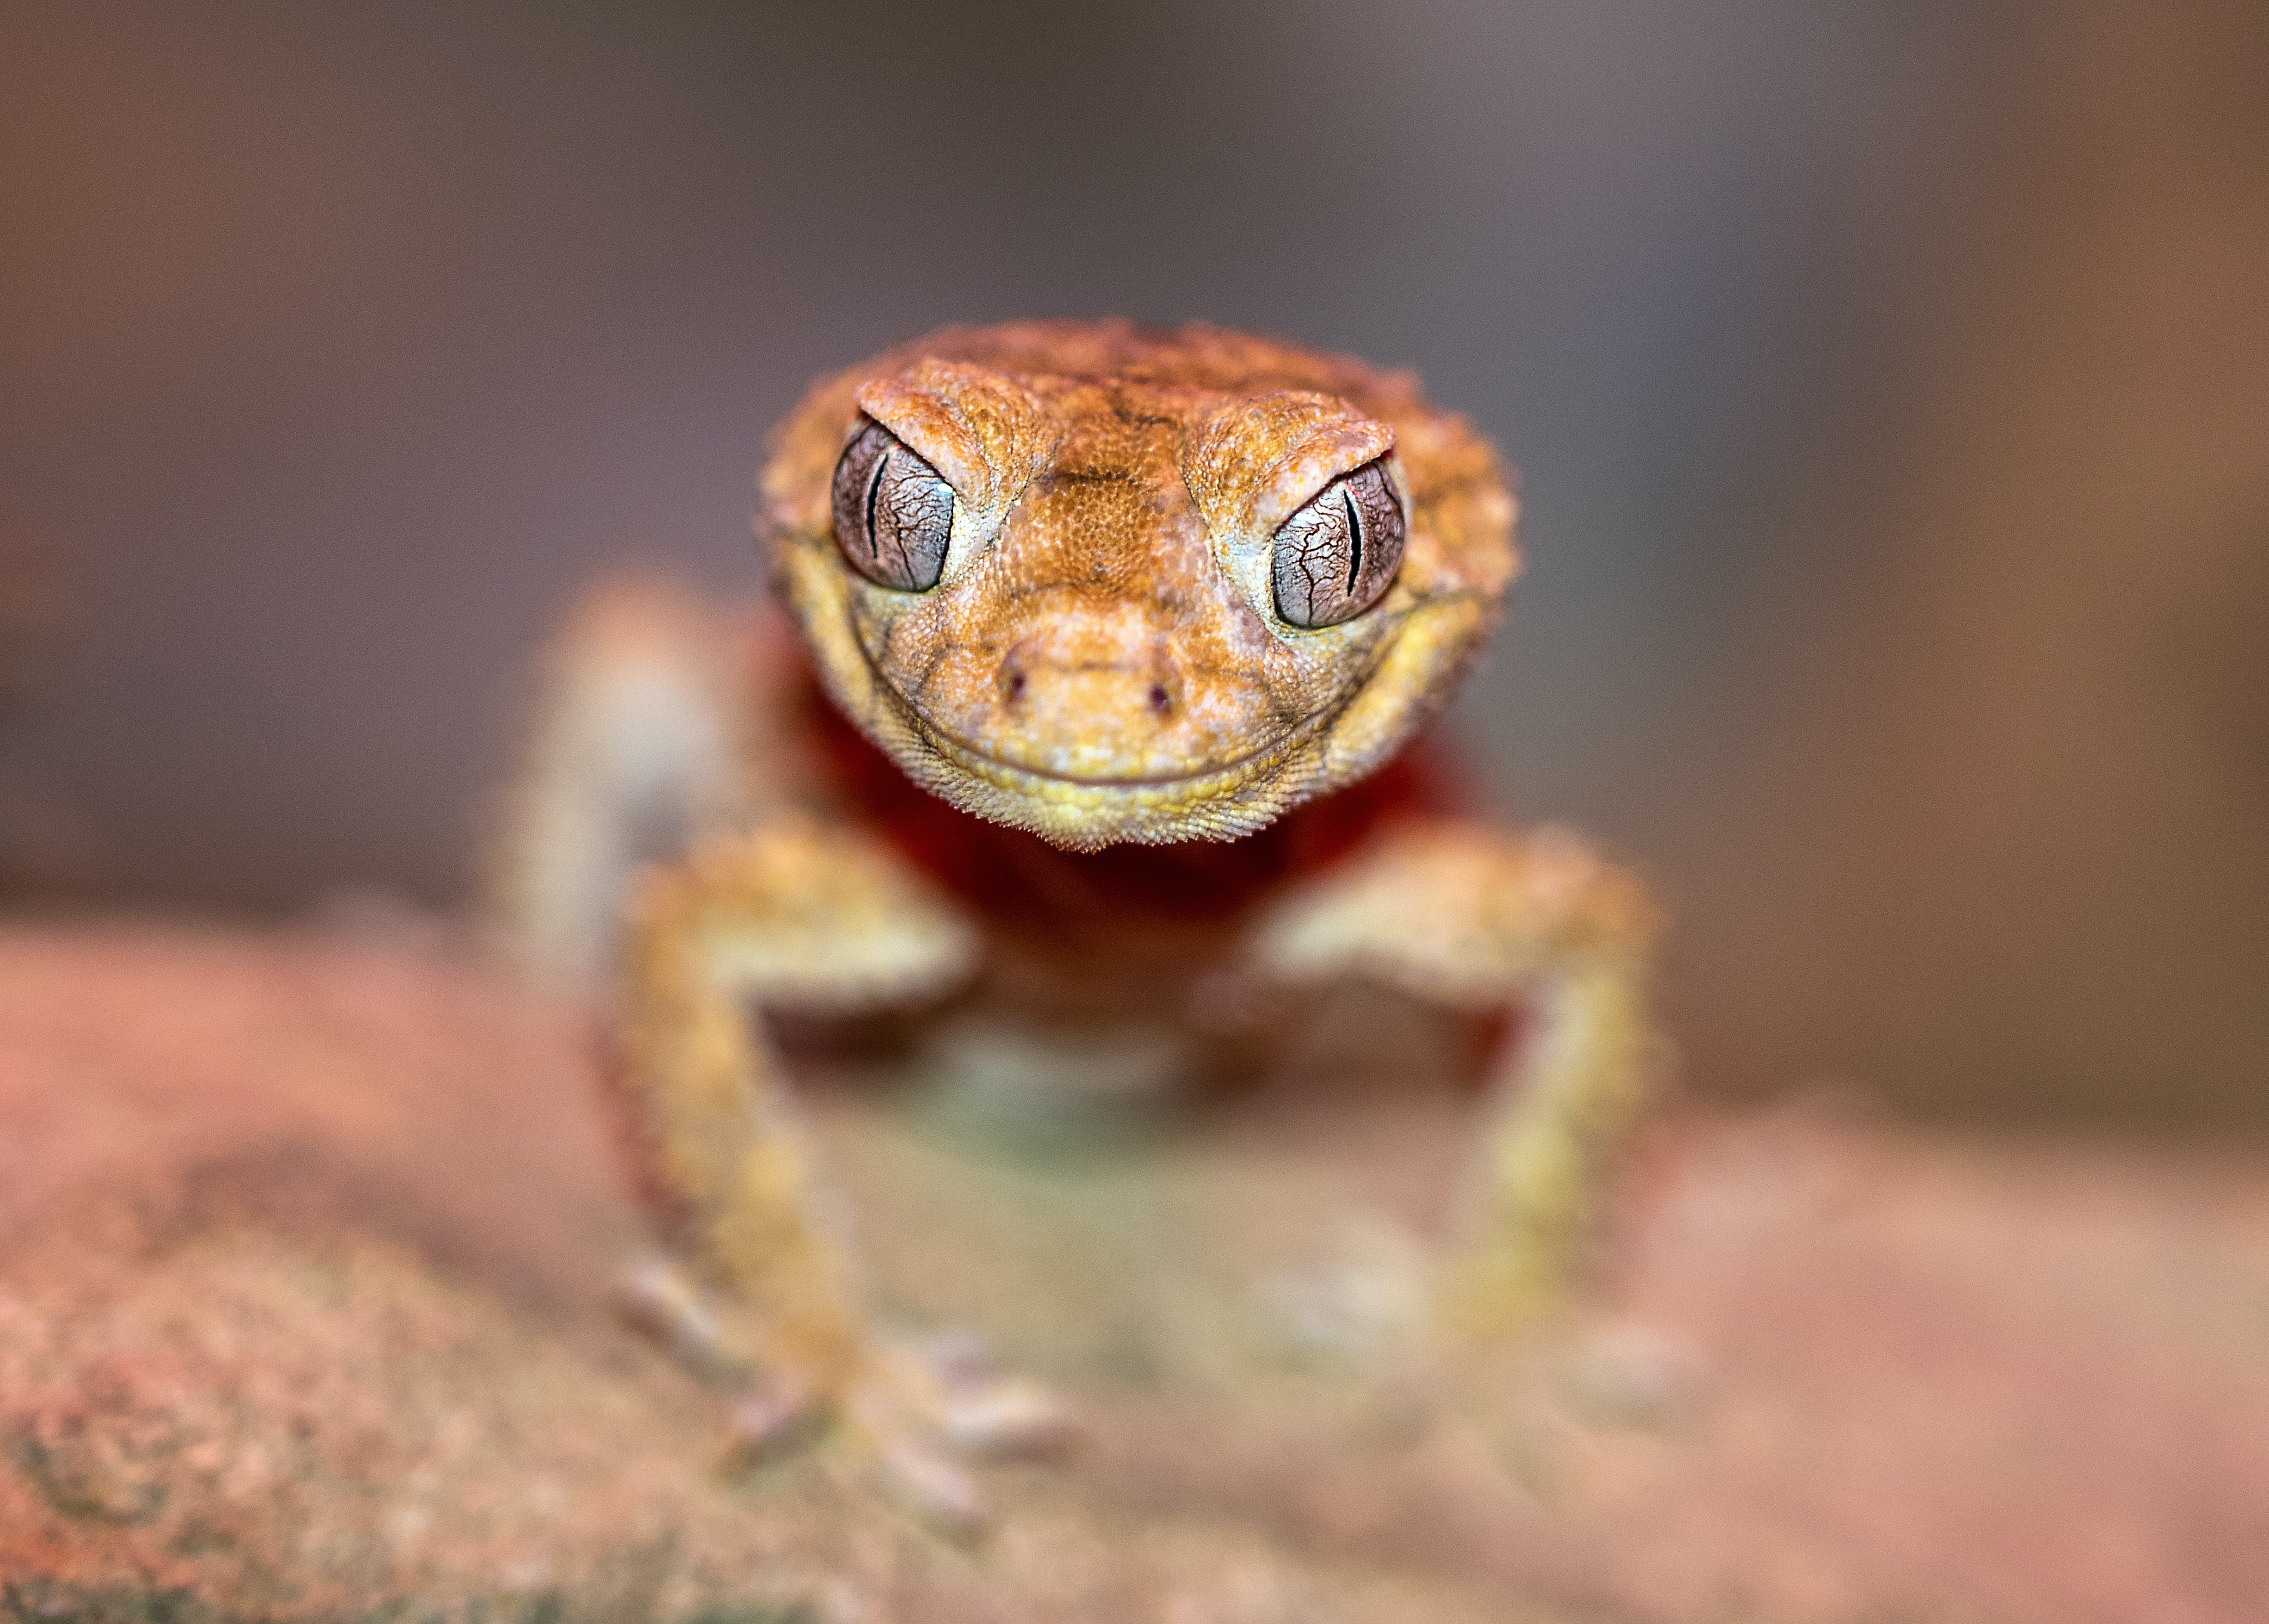 close-up photo of brown lizard